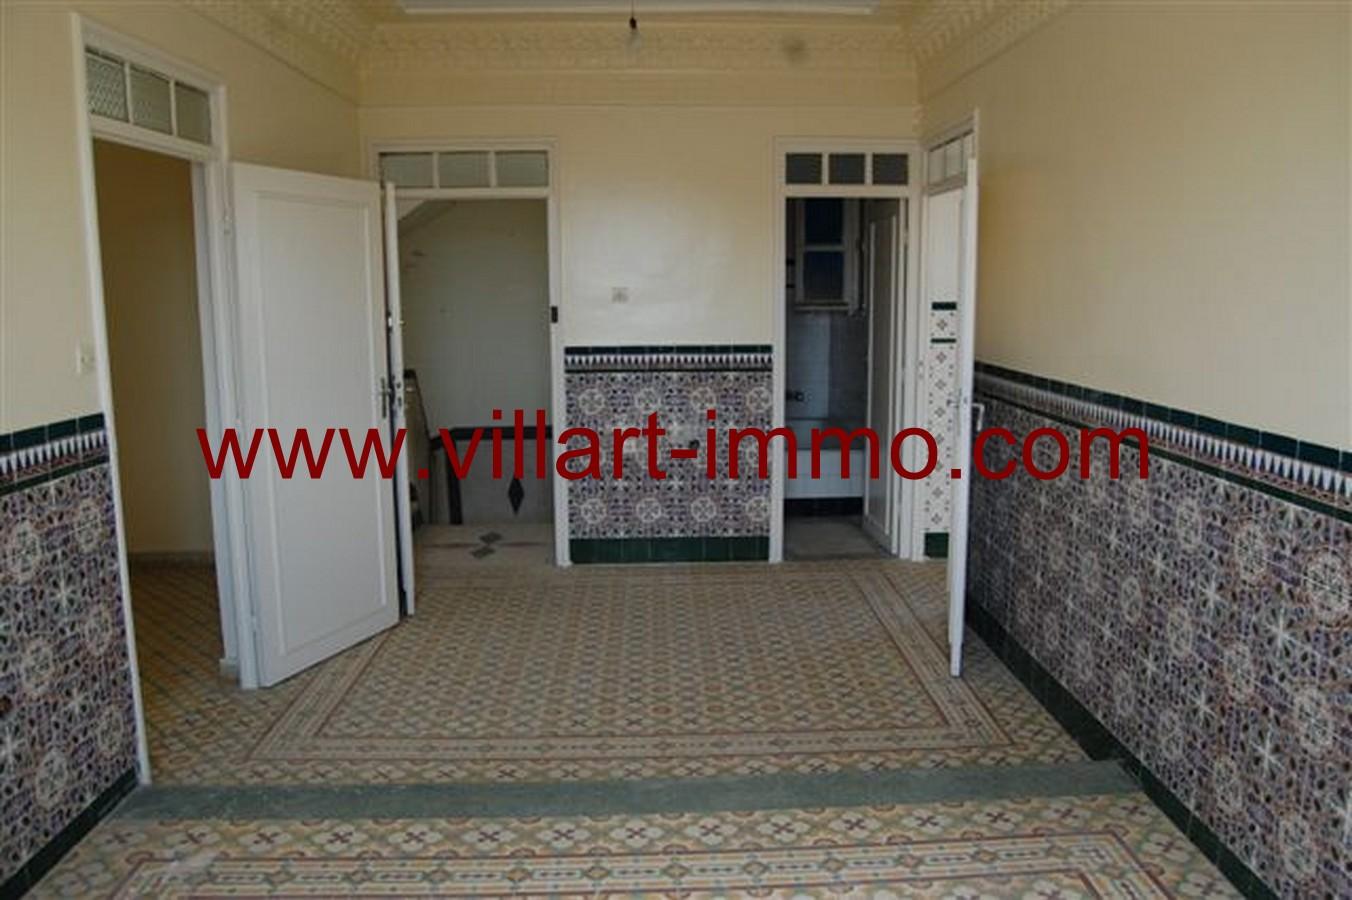 4-Vente-Appartement-Tanger-salon 2-VA532-Jirari-Villart Immo